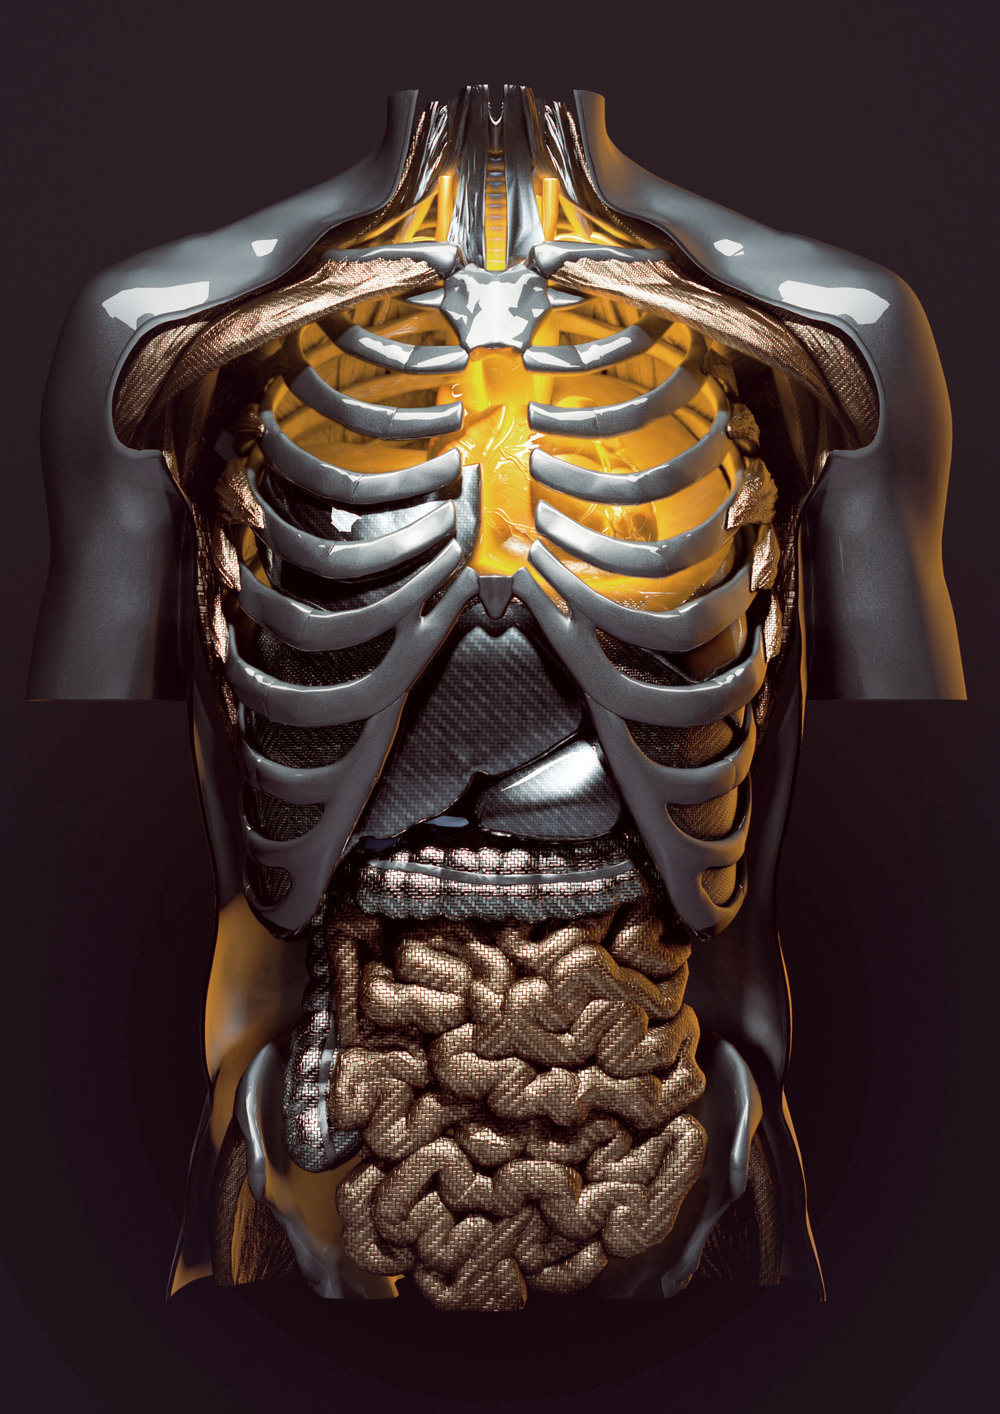 BOOM_CGI_MEDICAL_torso-engine.jpg